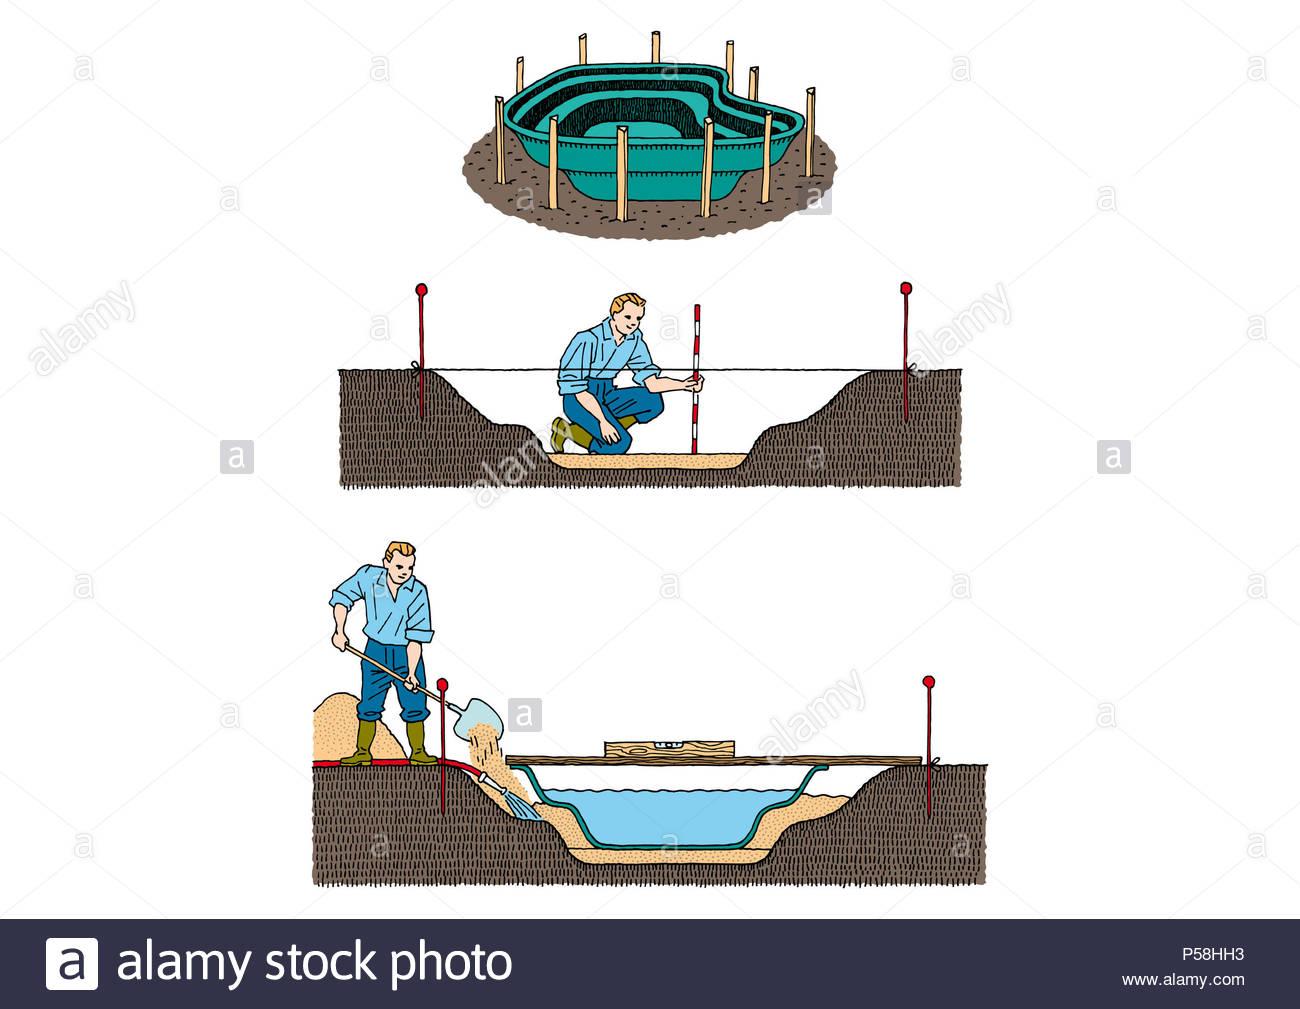 Création d\'étang de jardin 1 étang fini Banque D\'Images, Photo Stock ...